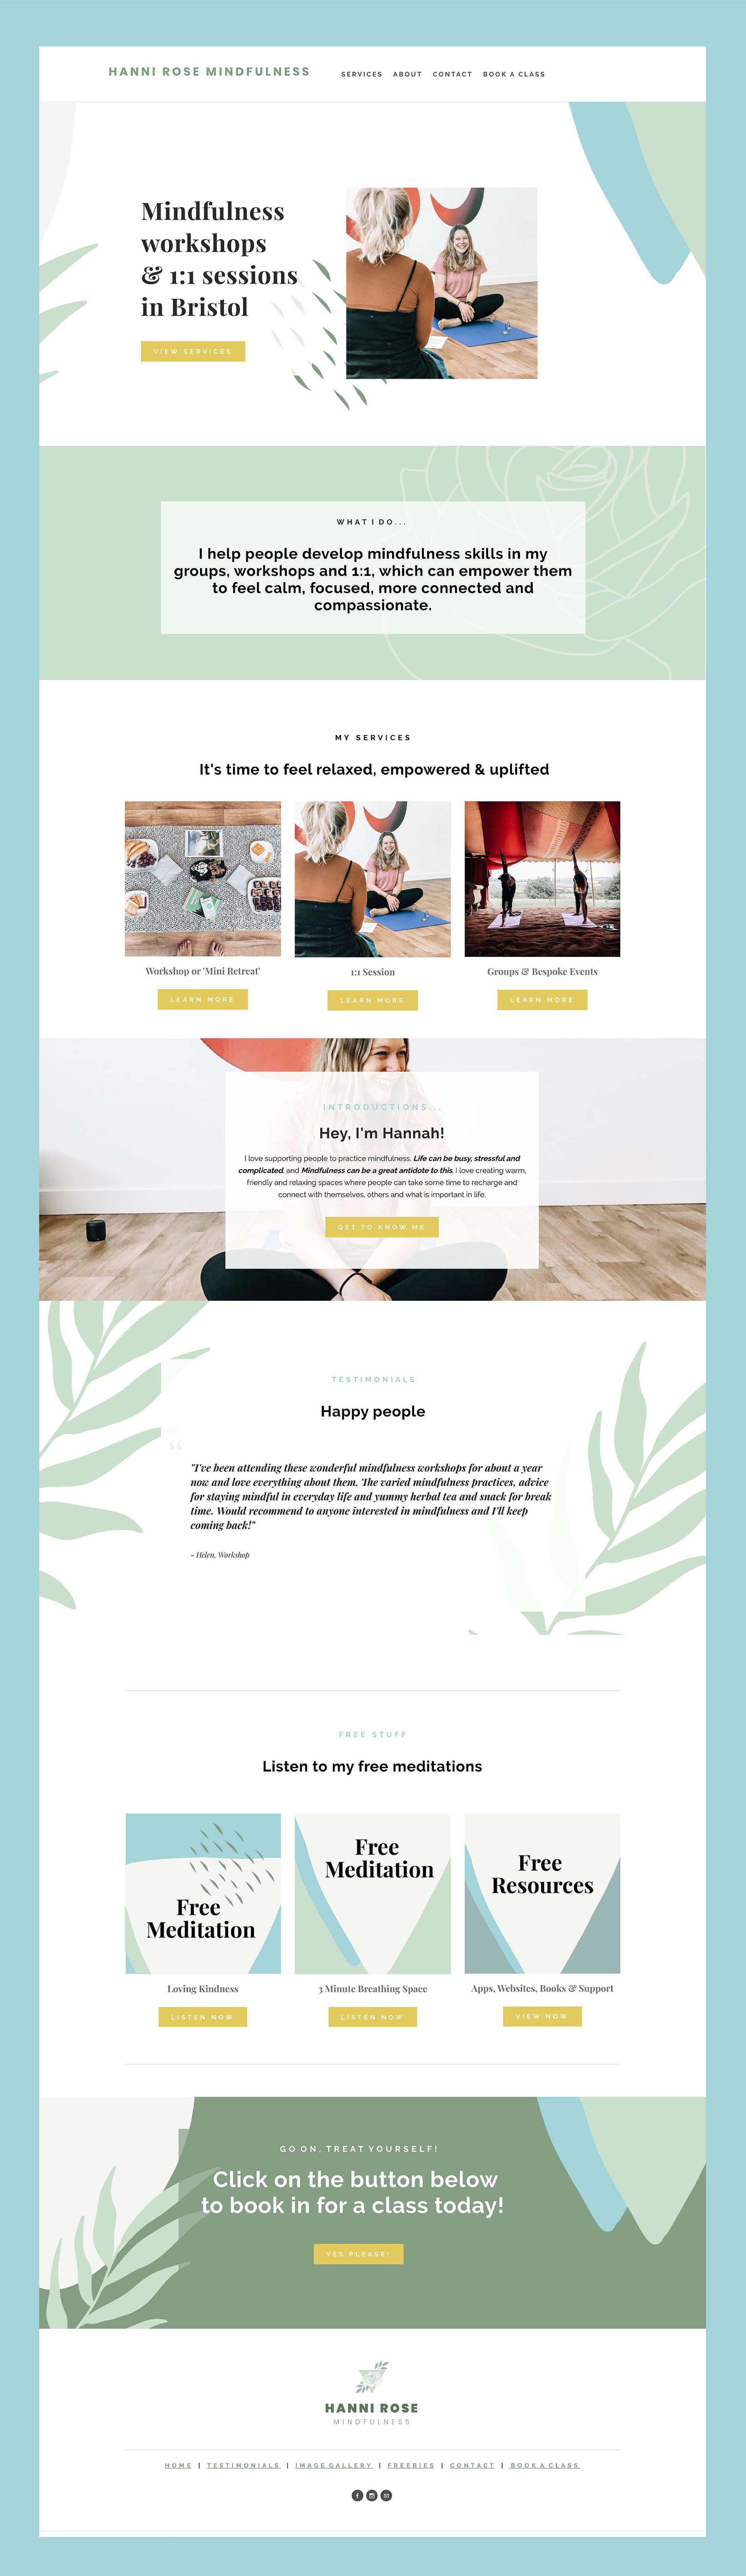 Small Business Web Design 3